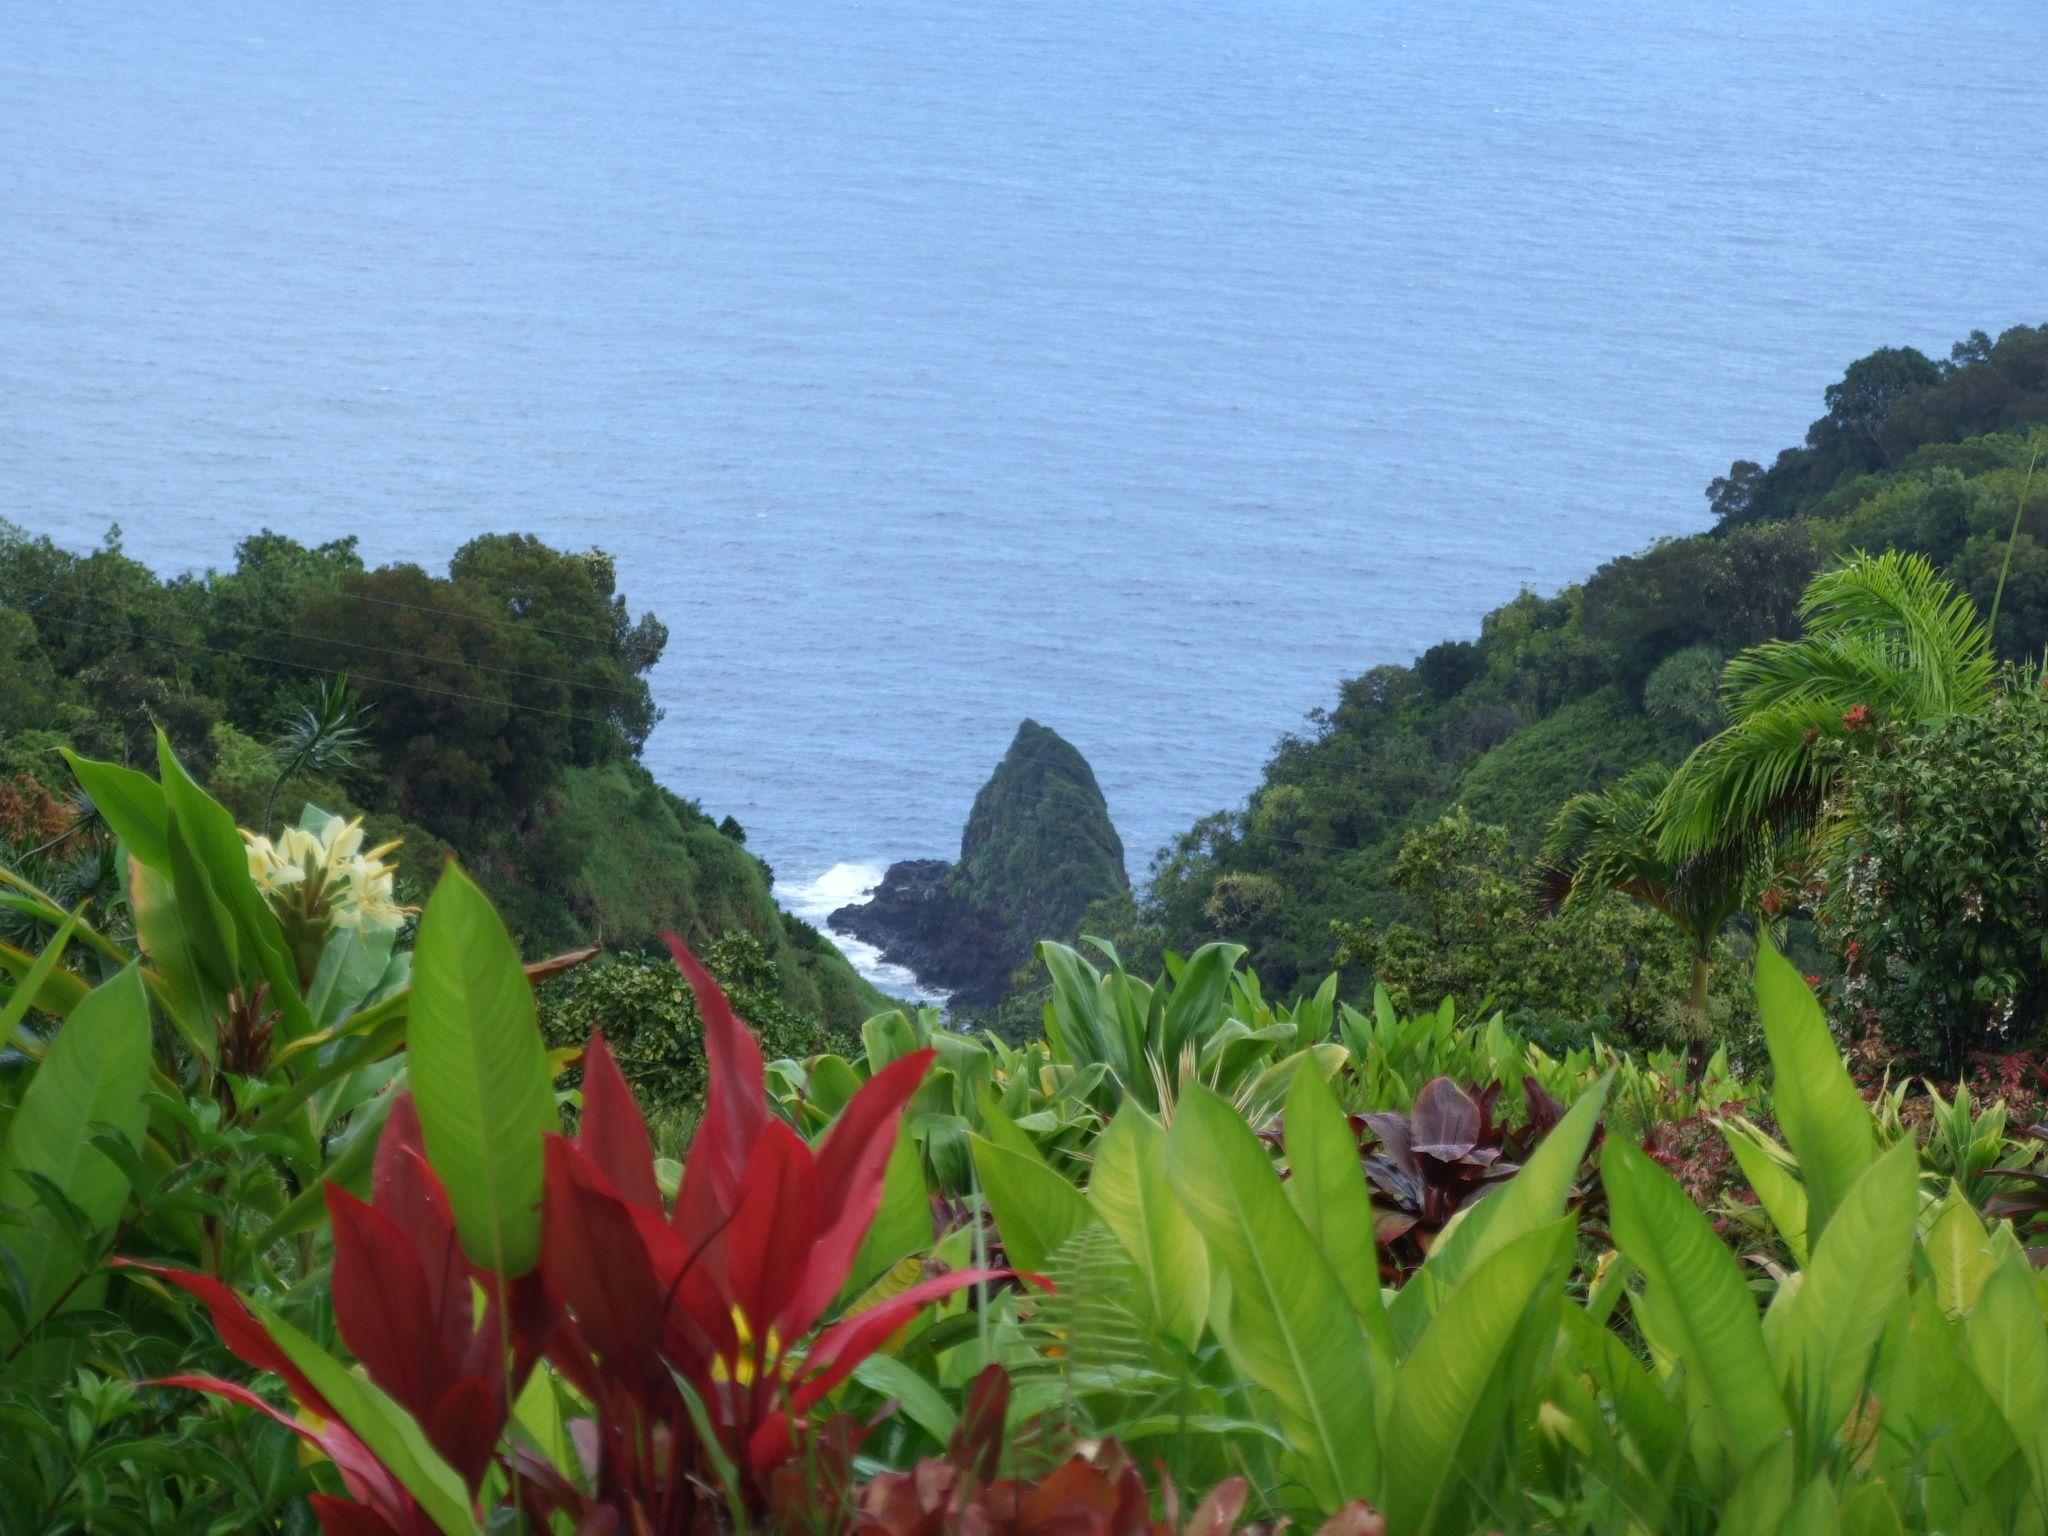 25c53bb463807c796bb5a96fa85e92e4 - Hana Maui Botanical Gardens Hana Hi